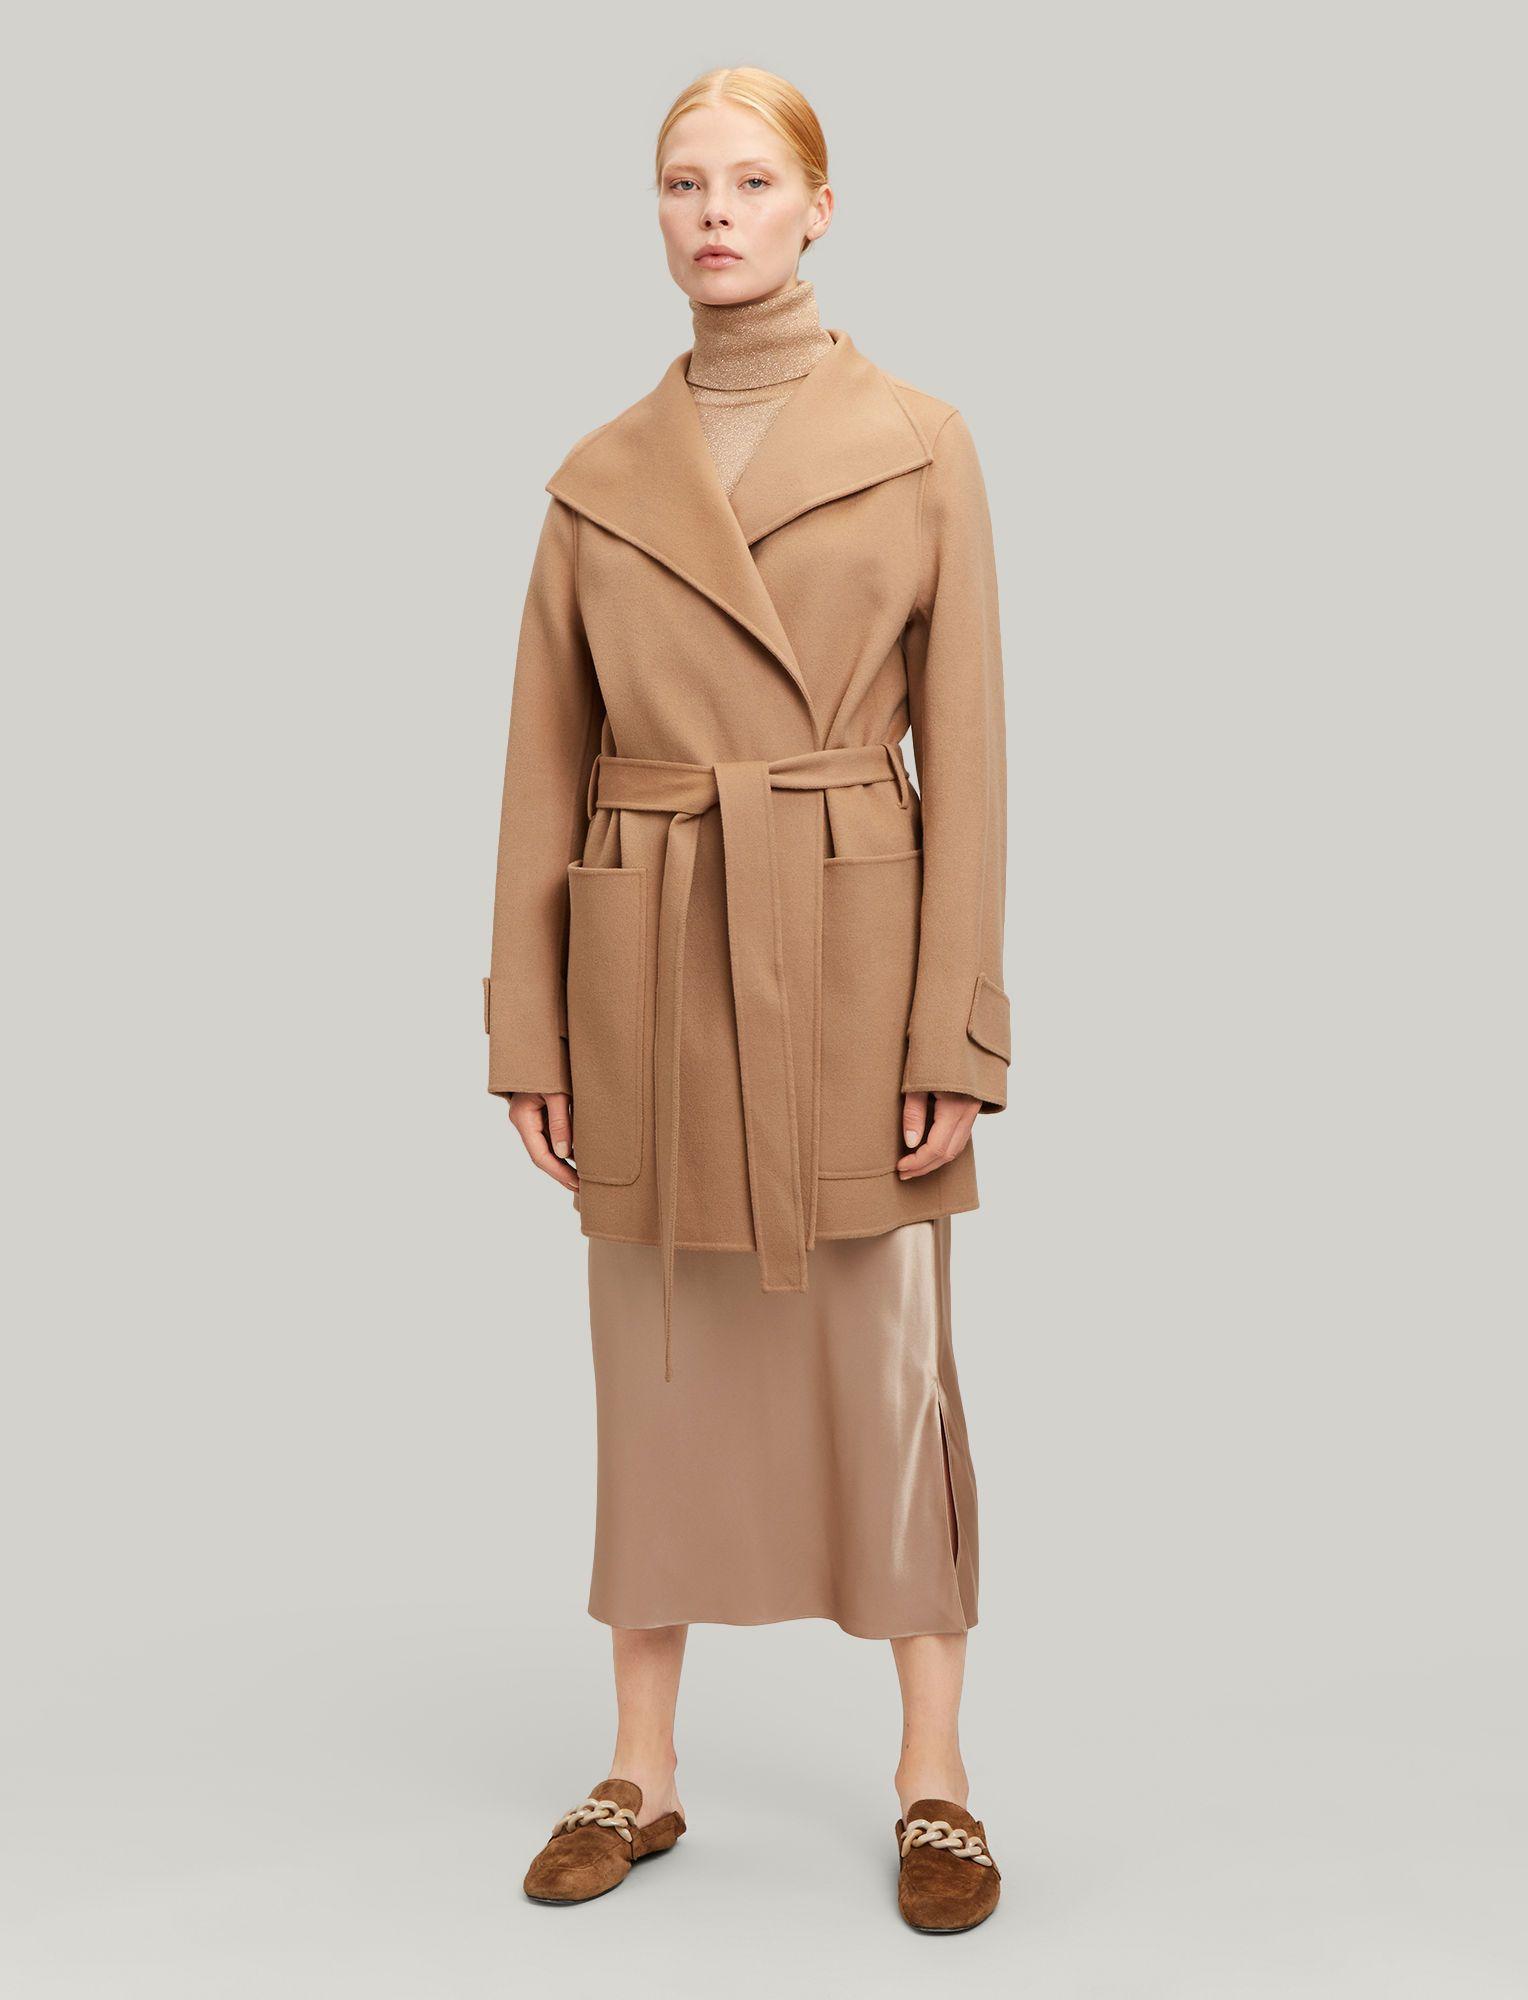 7eb65130fa3 Joseph, Lista Short Double Wool Gloss Coat, in CAMEL | AW19 in 2019 ...